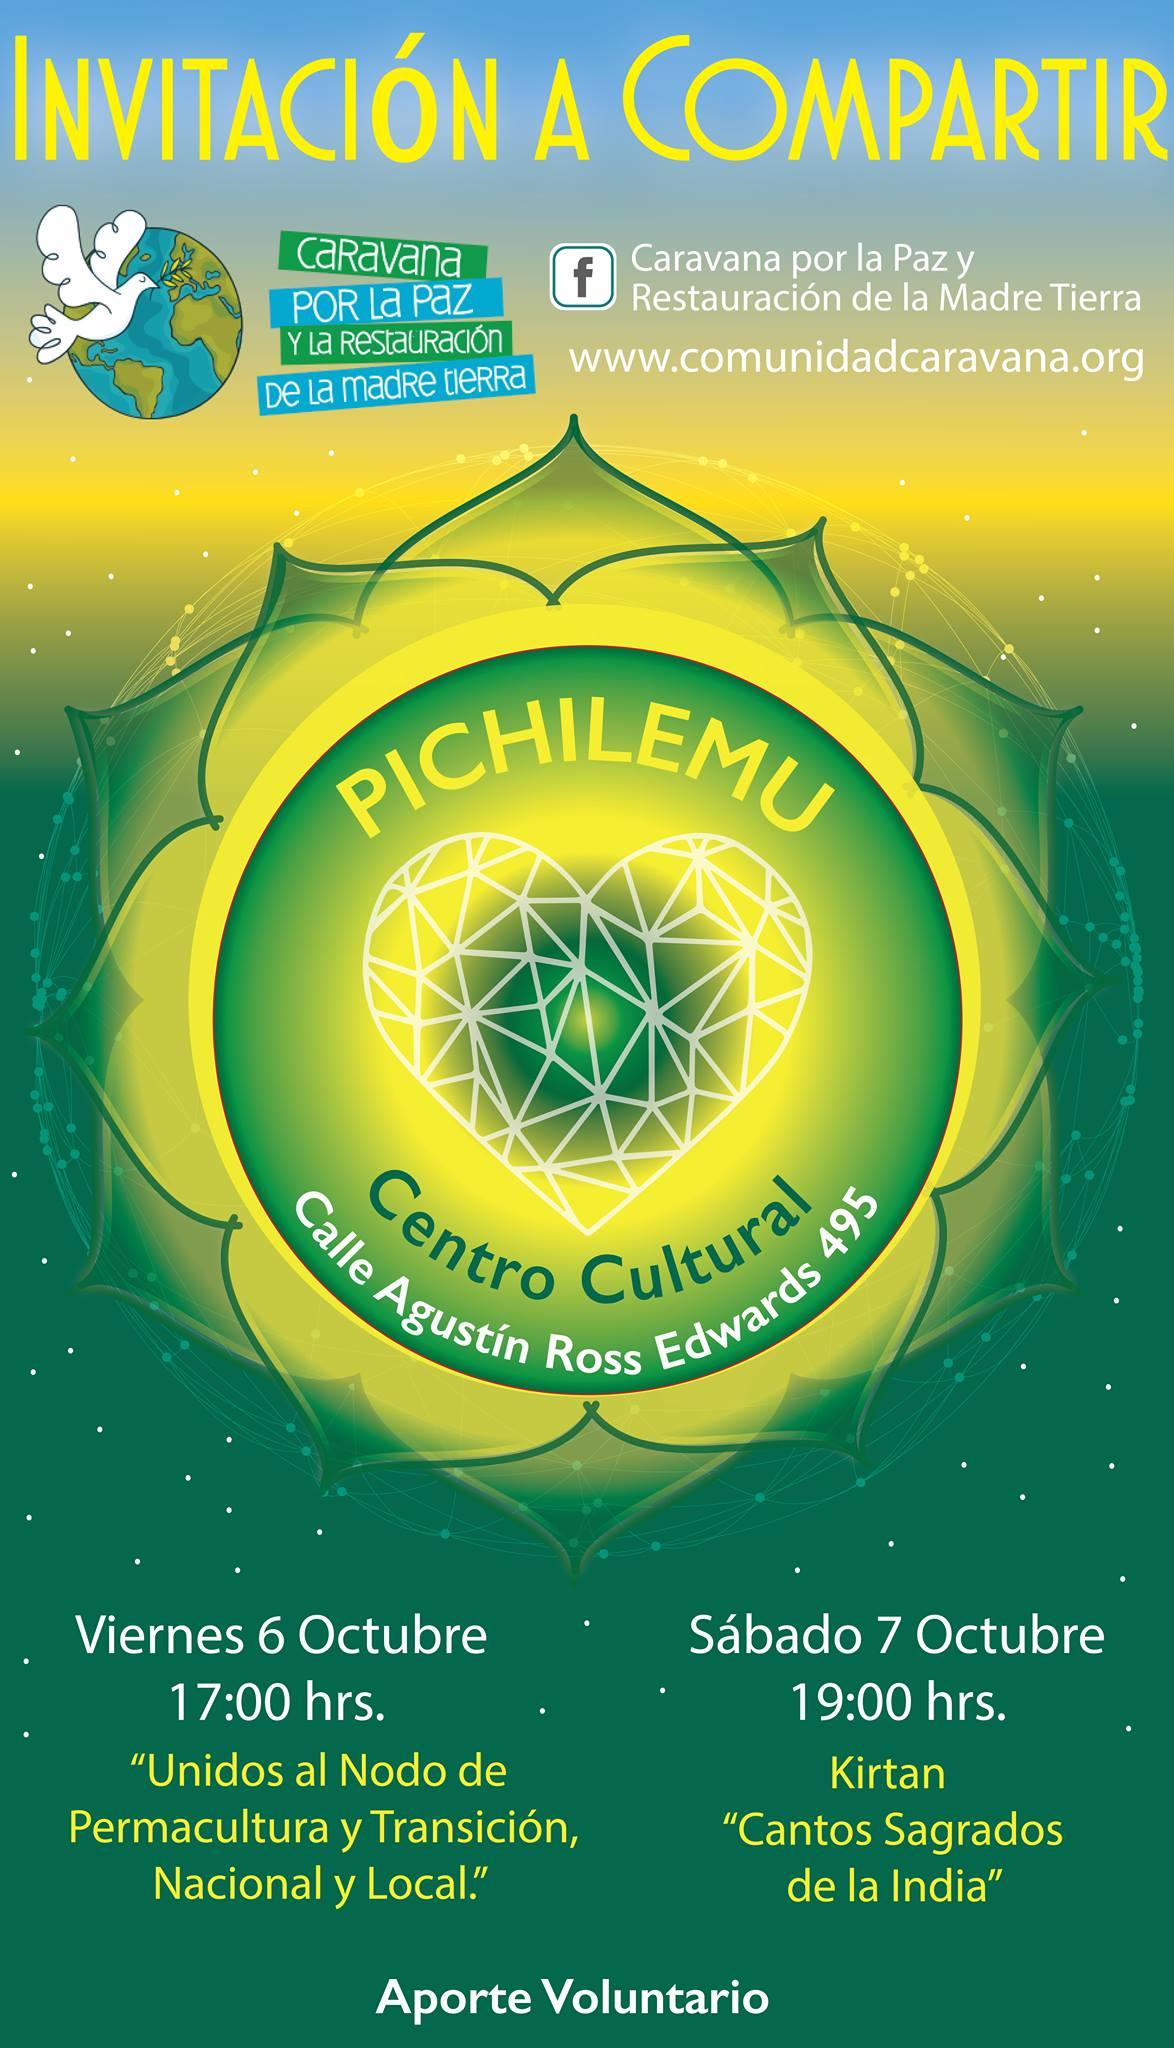 Pichilemu está llamando